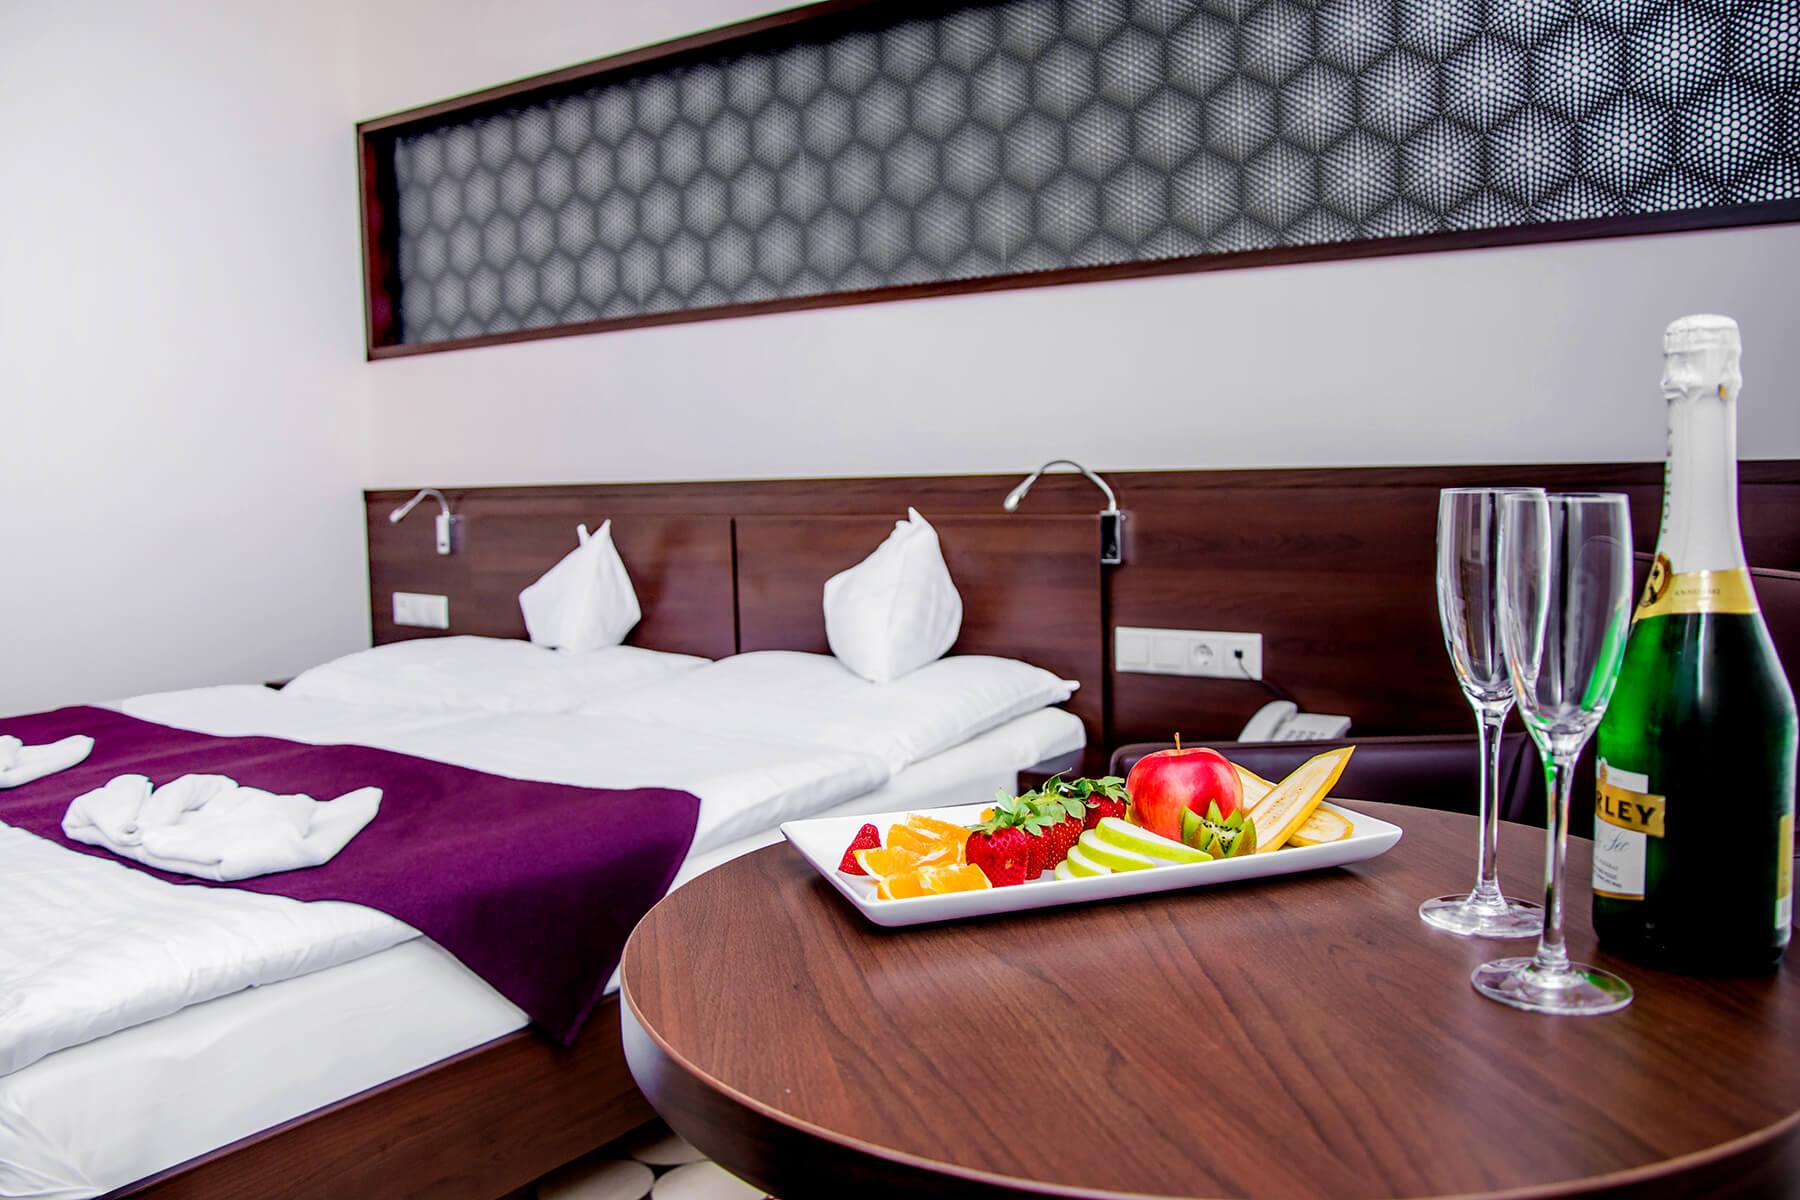 hotel-aurora-szobak5.jpg